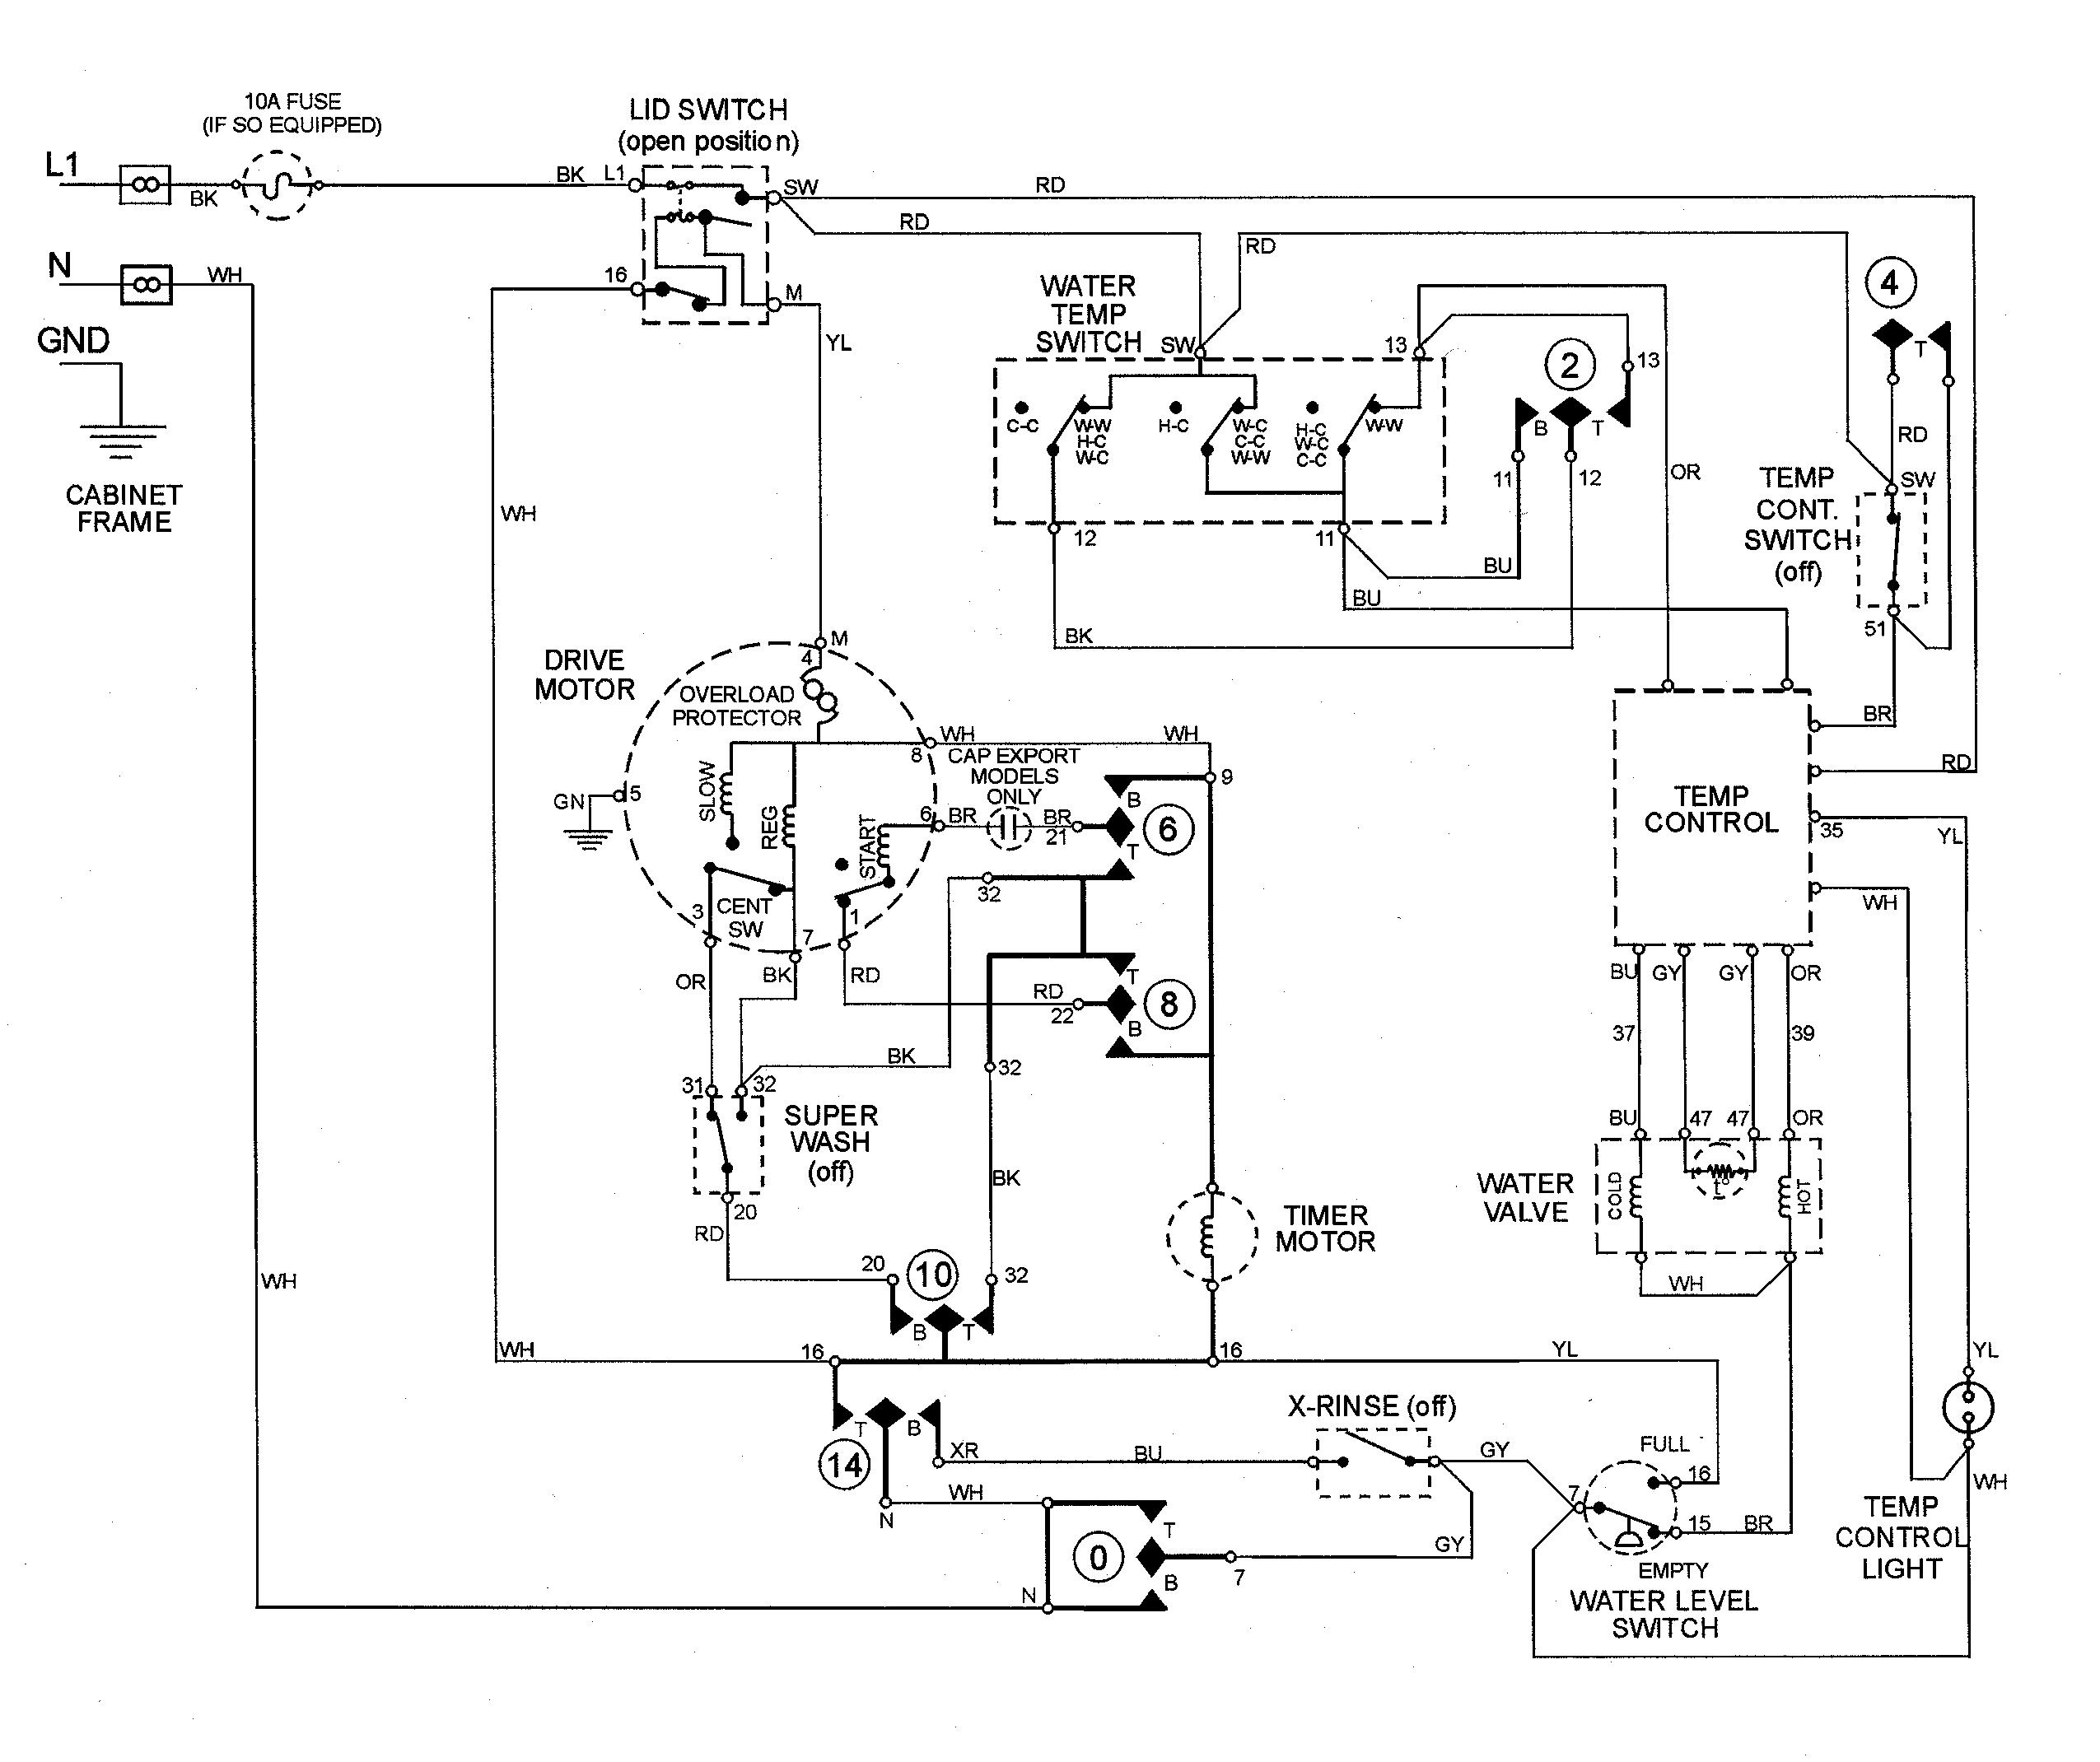 Wiring Diagram For Ge Refrigerator | Ge Profile Wiring Schematic |  | Wiring Diagram